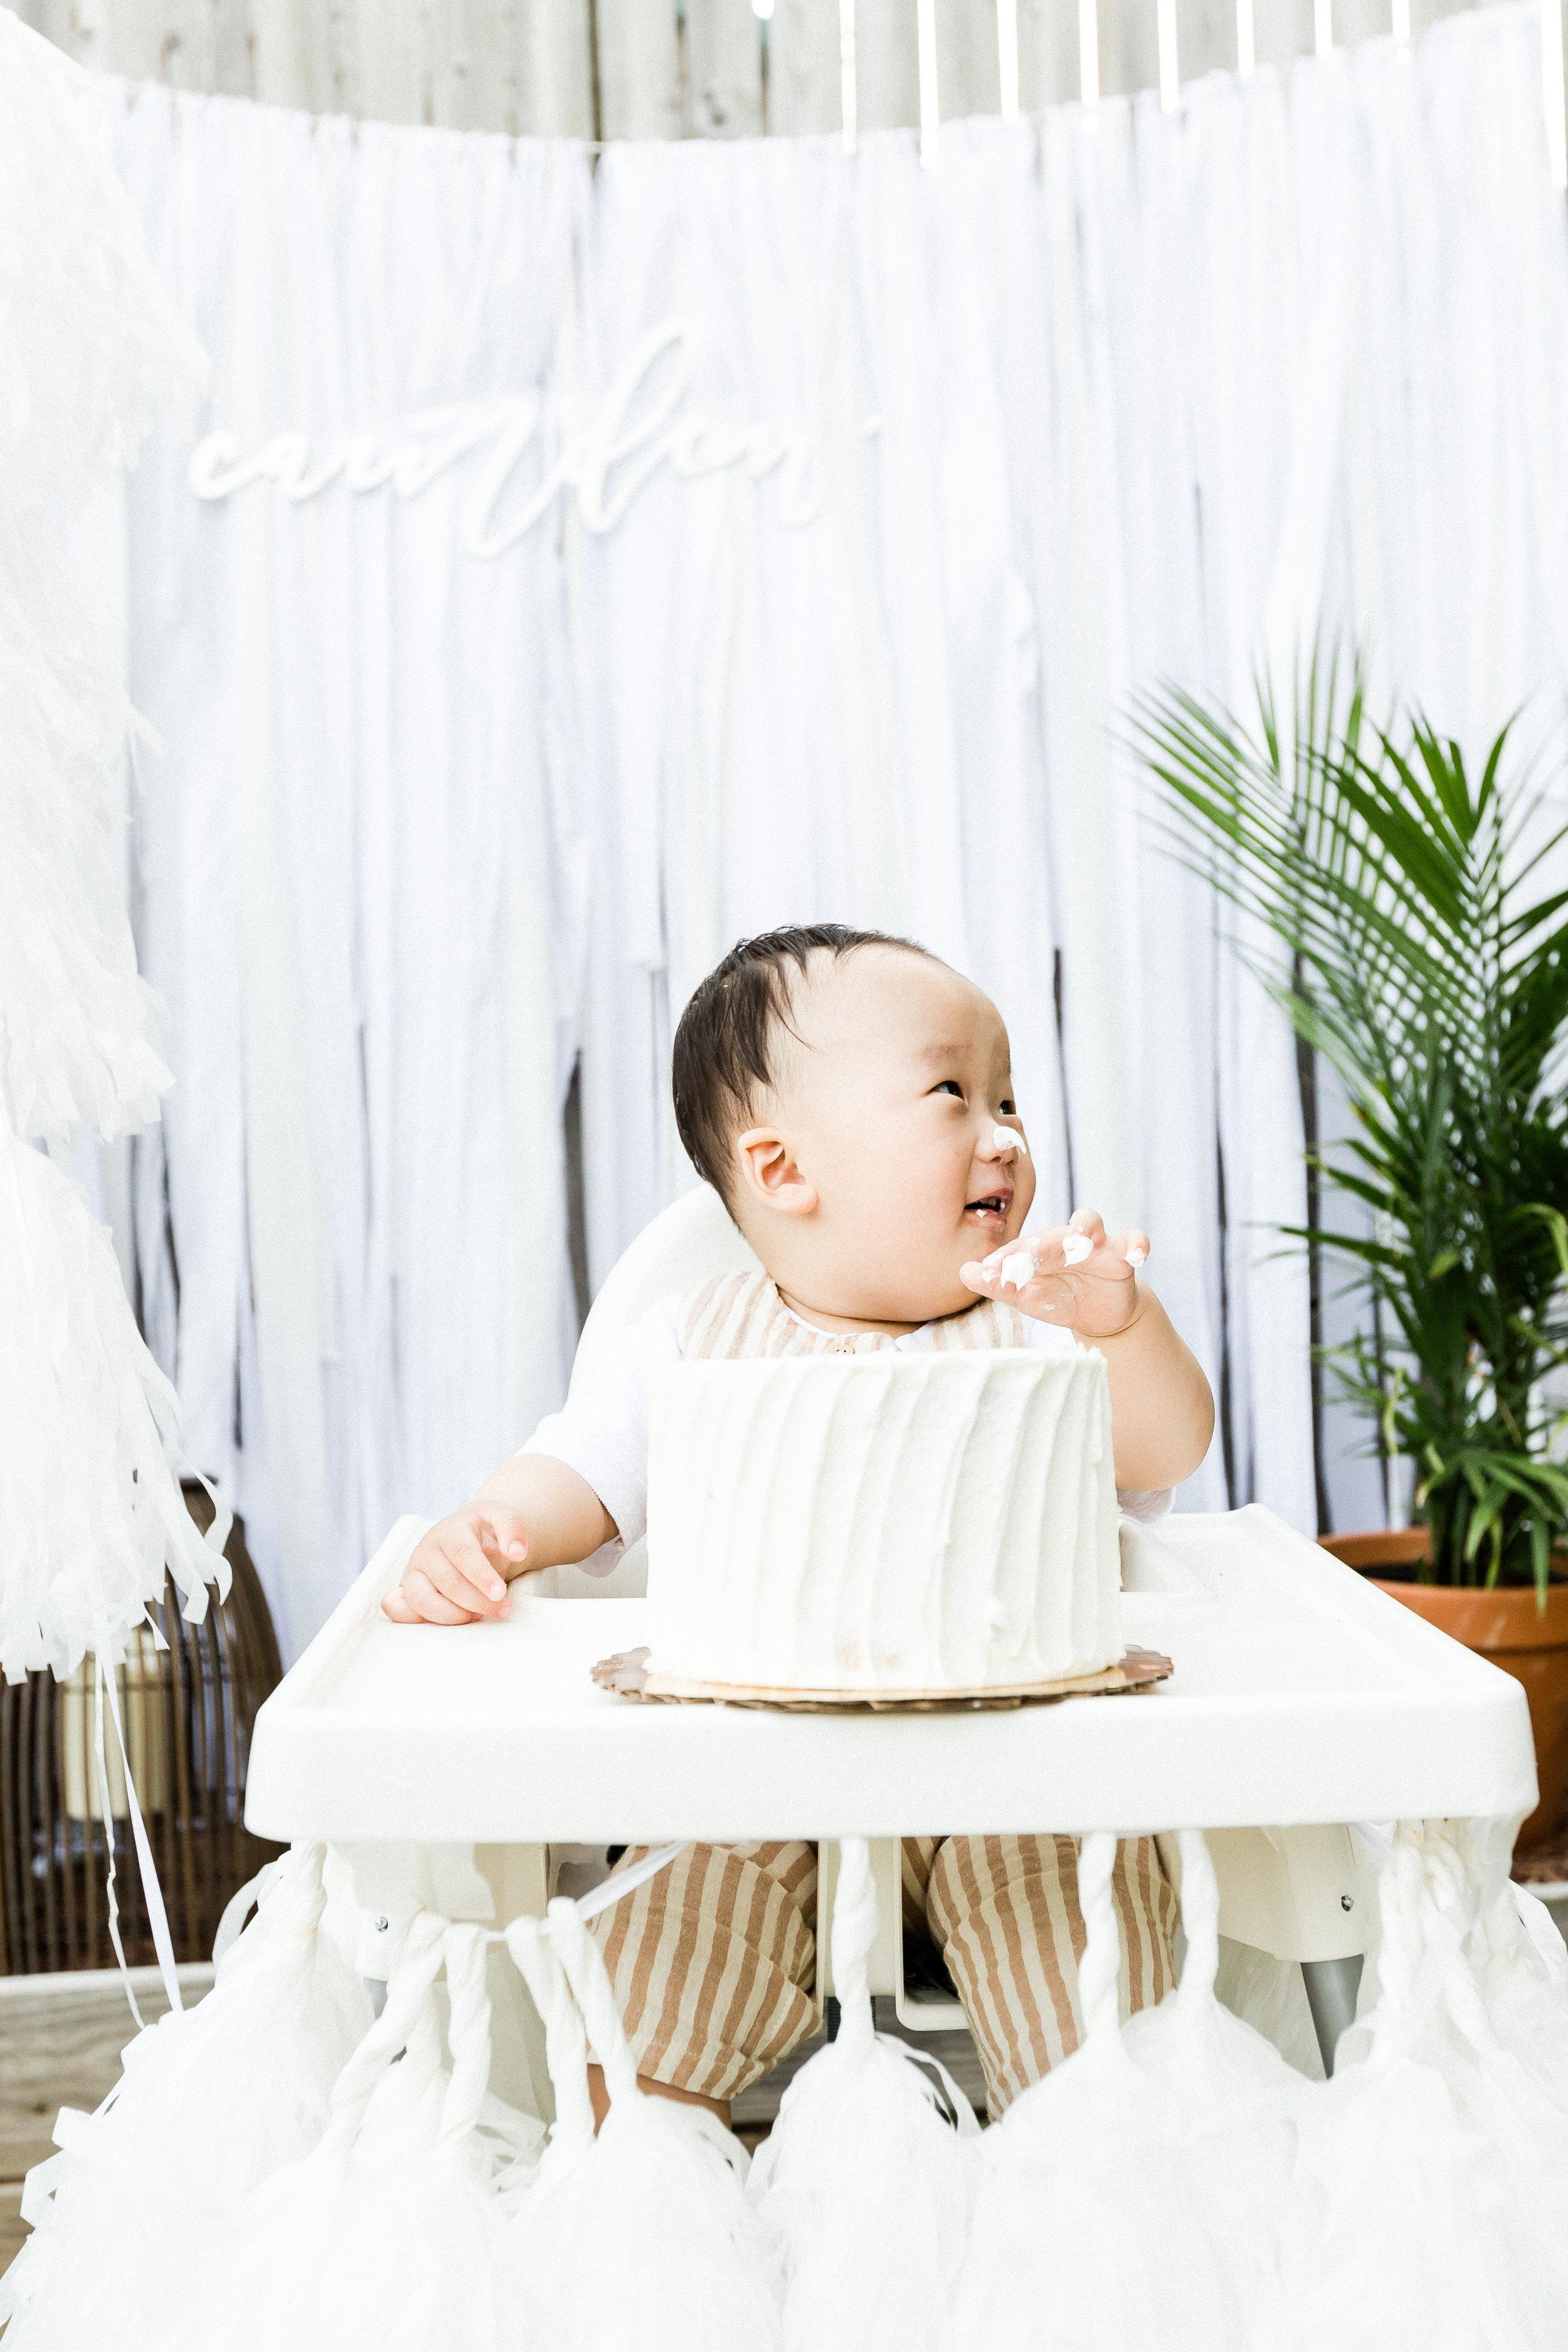 lissie-loomis-photo-nyc-family-photographer-brooklyn-baby55.JPG